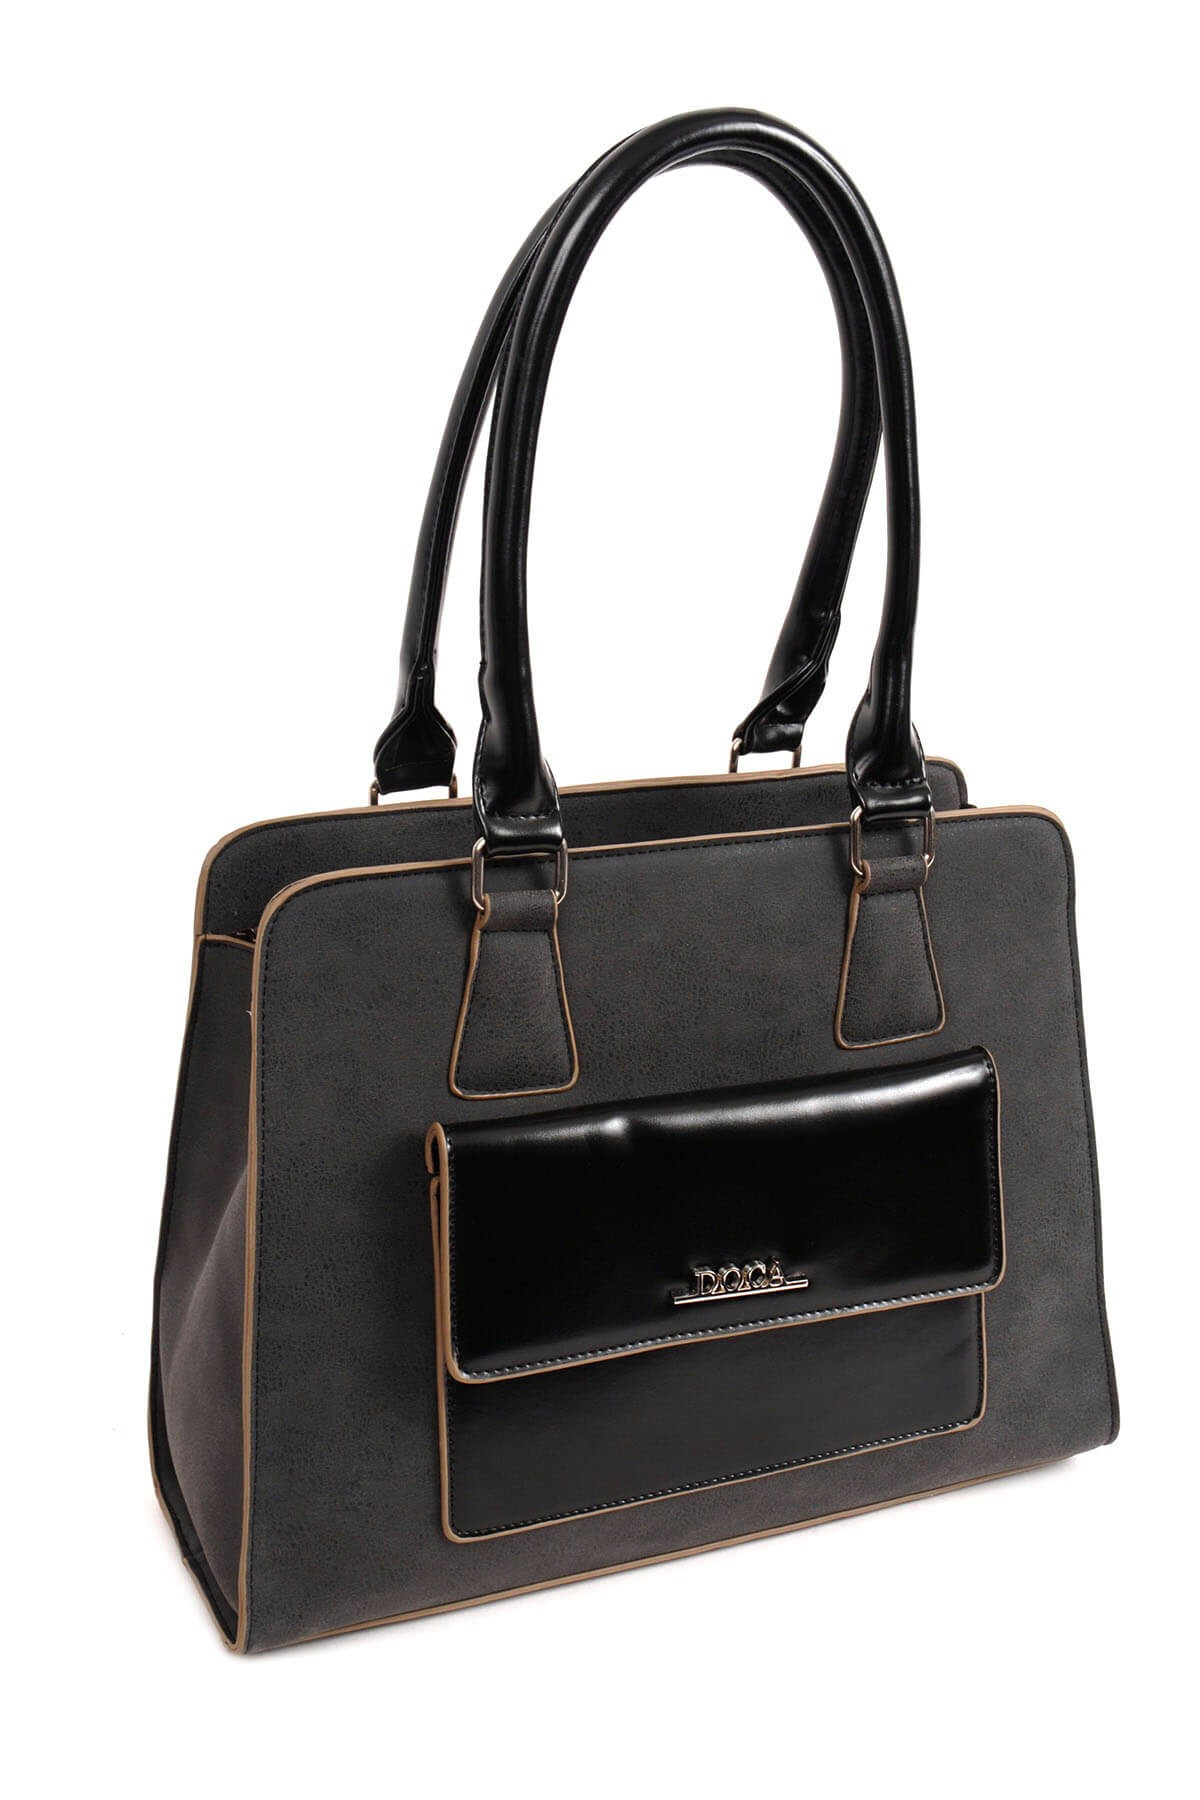 Dámska kabelka Doca 14168 - čierna